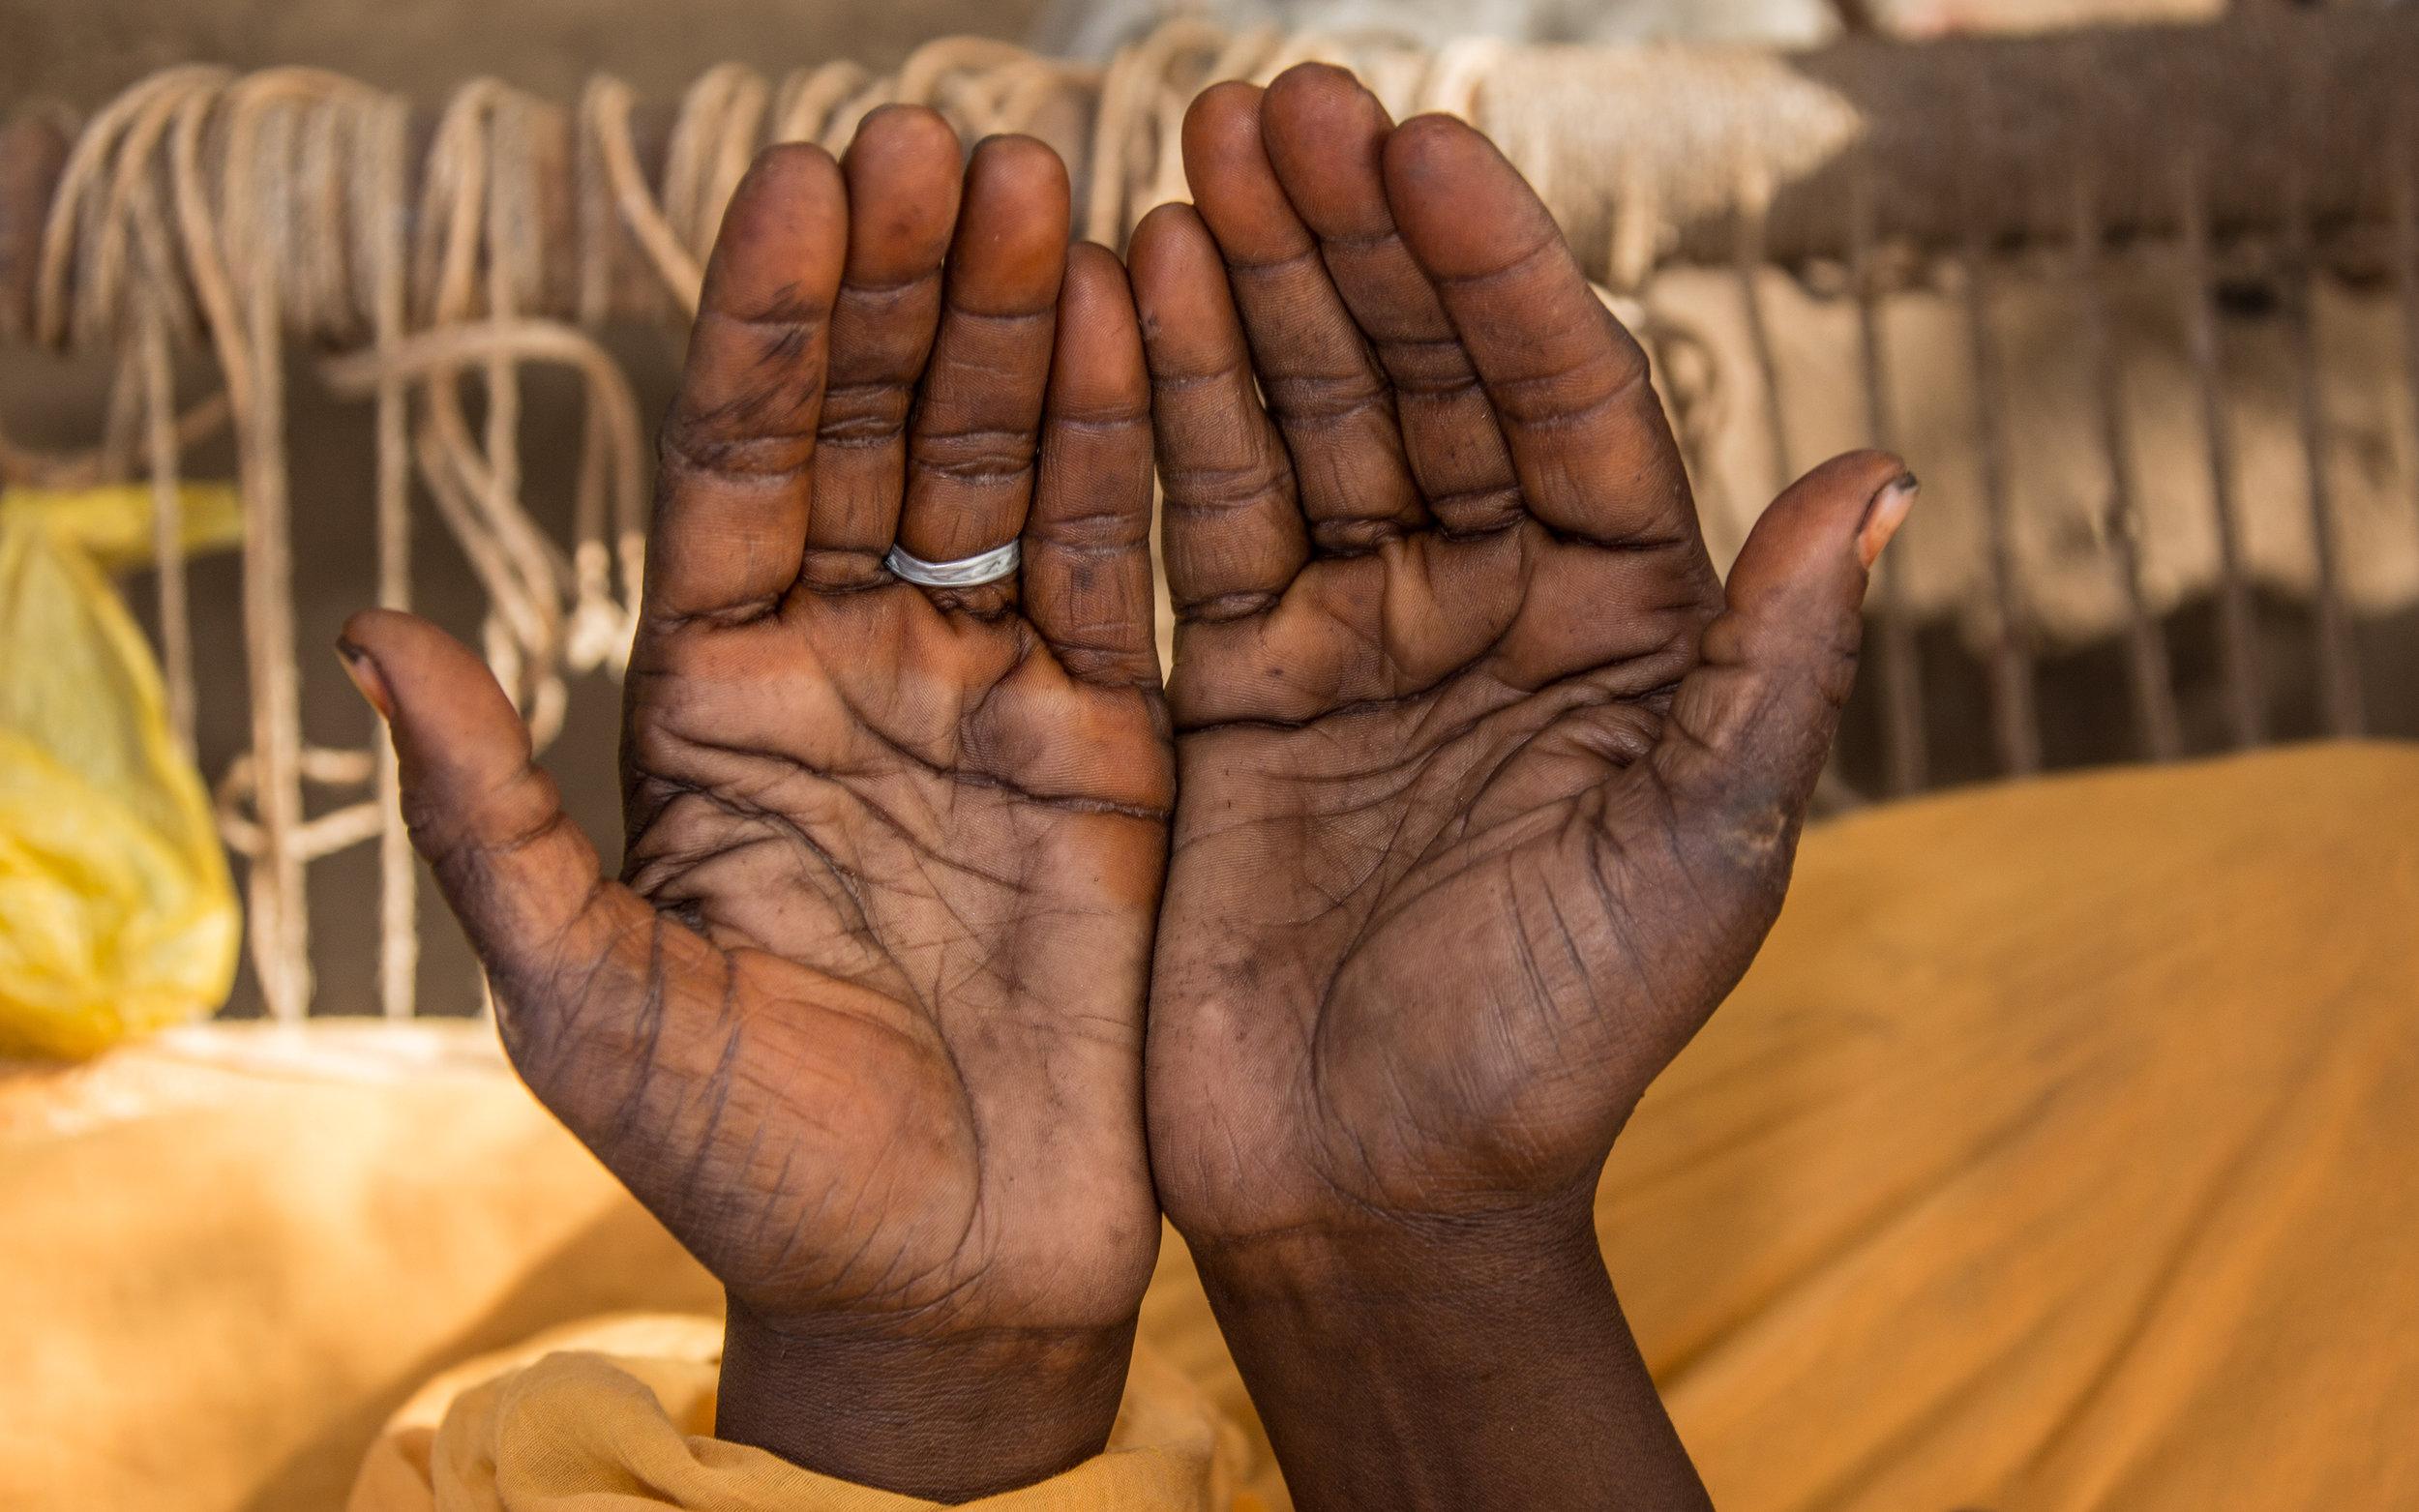 Sudan-Hands.jpg